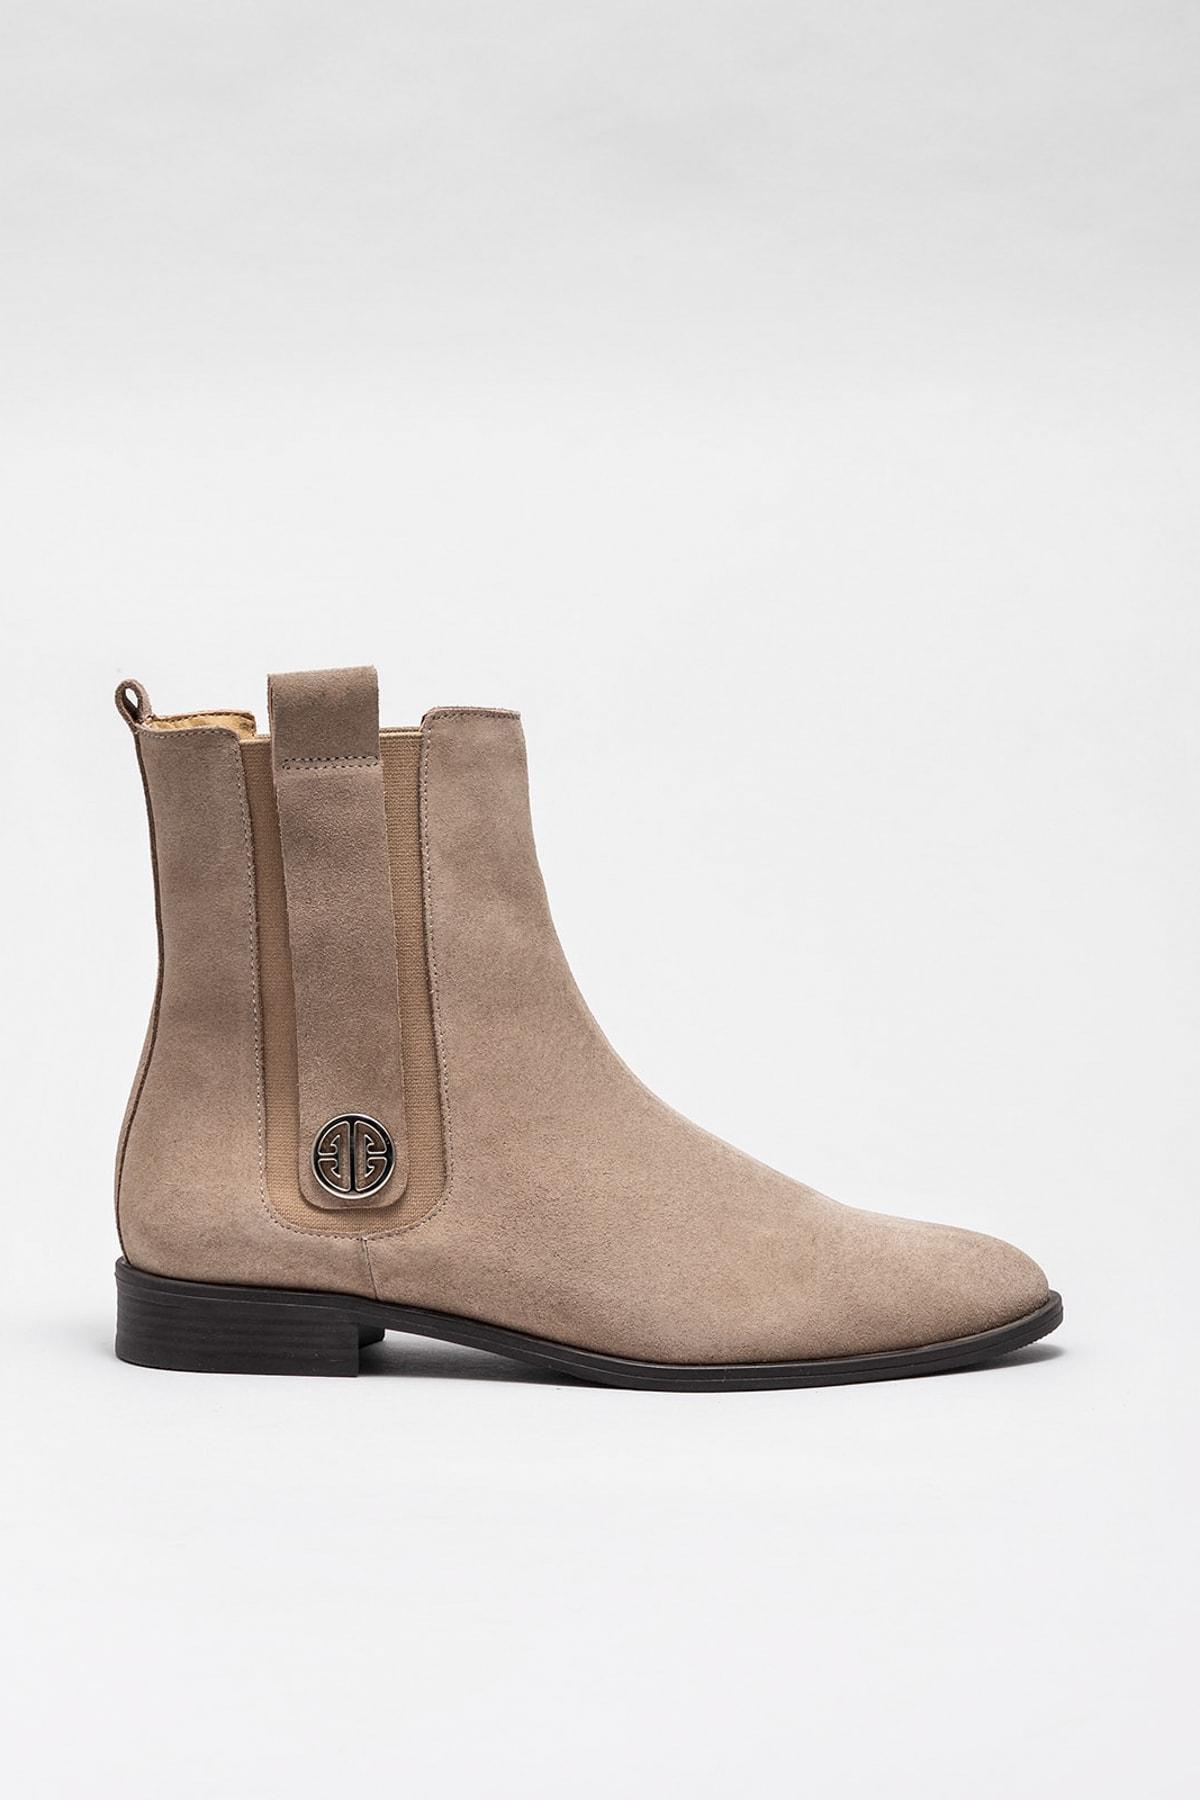 Elle Shoes Kadın Koloma Vızon Bot & Bootie 20KZA02161-88 1